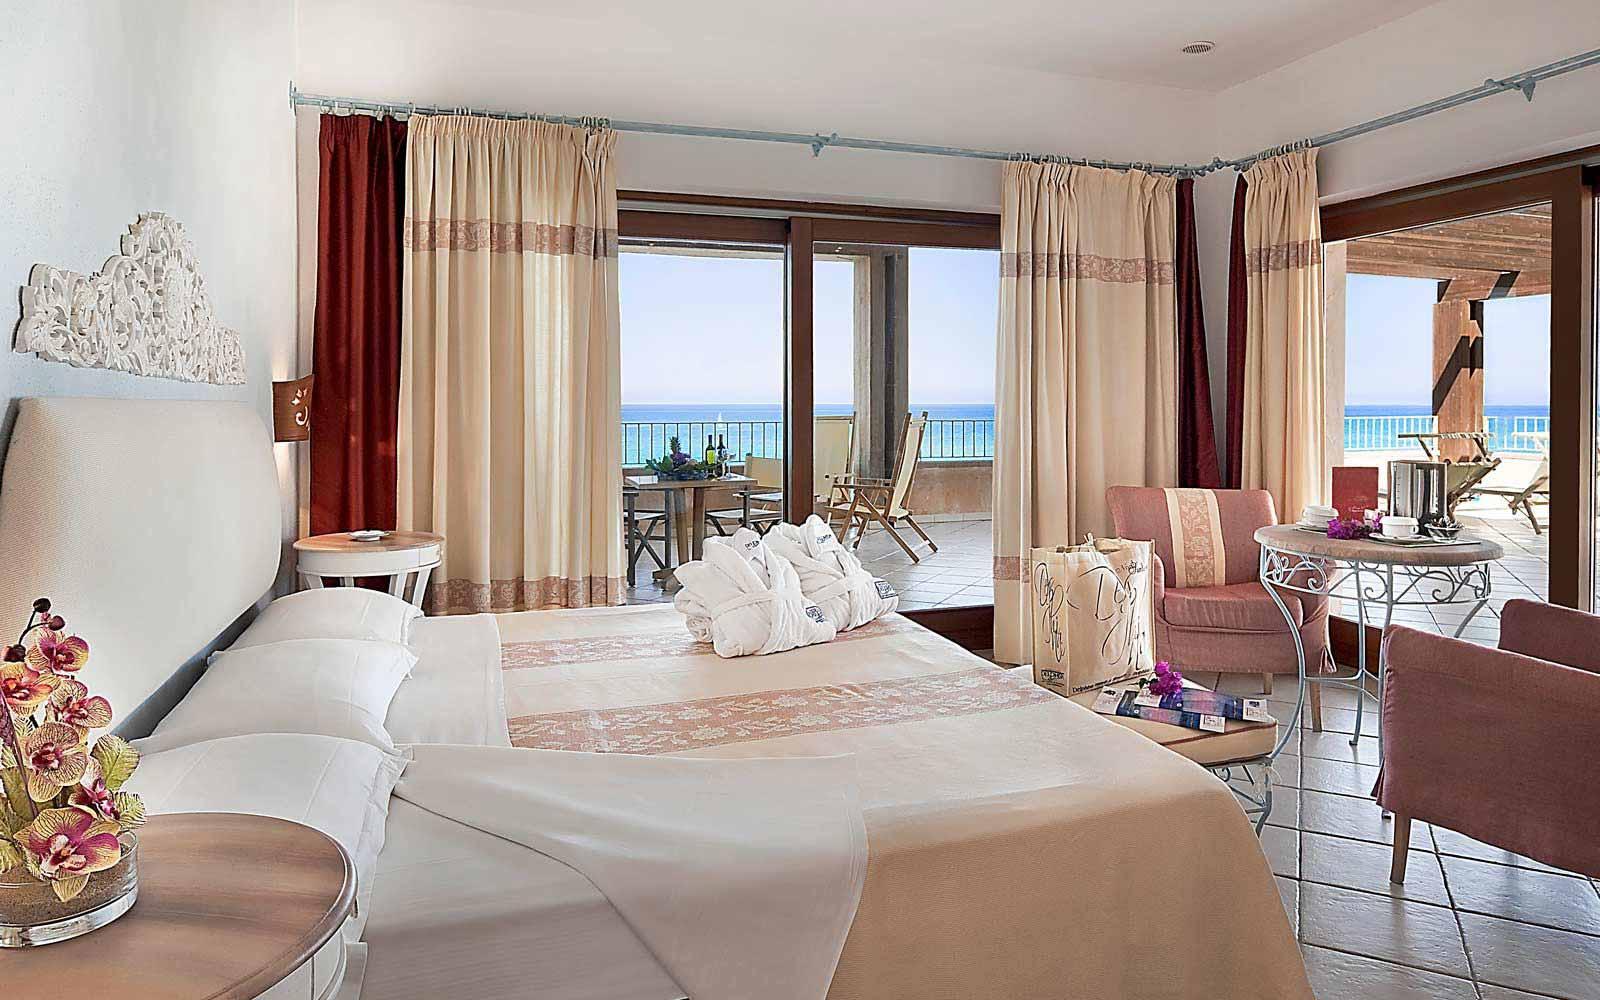 Royal room with sea view at Hotel Duna Bianca